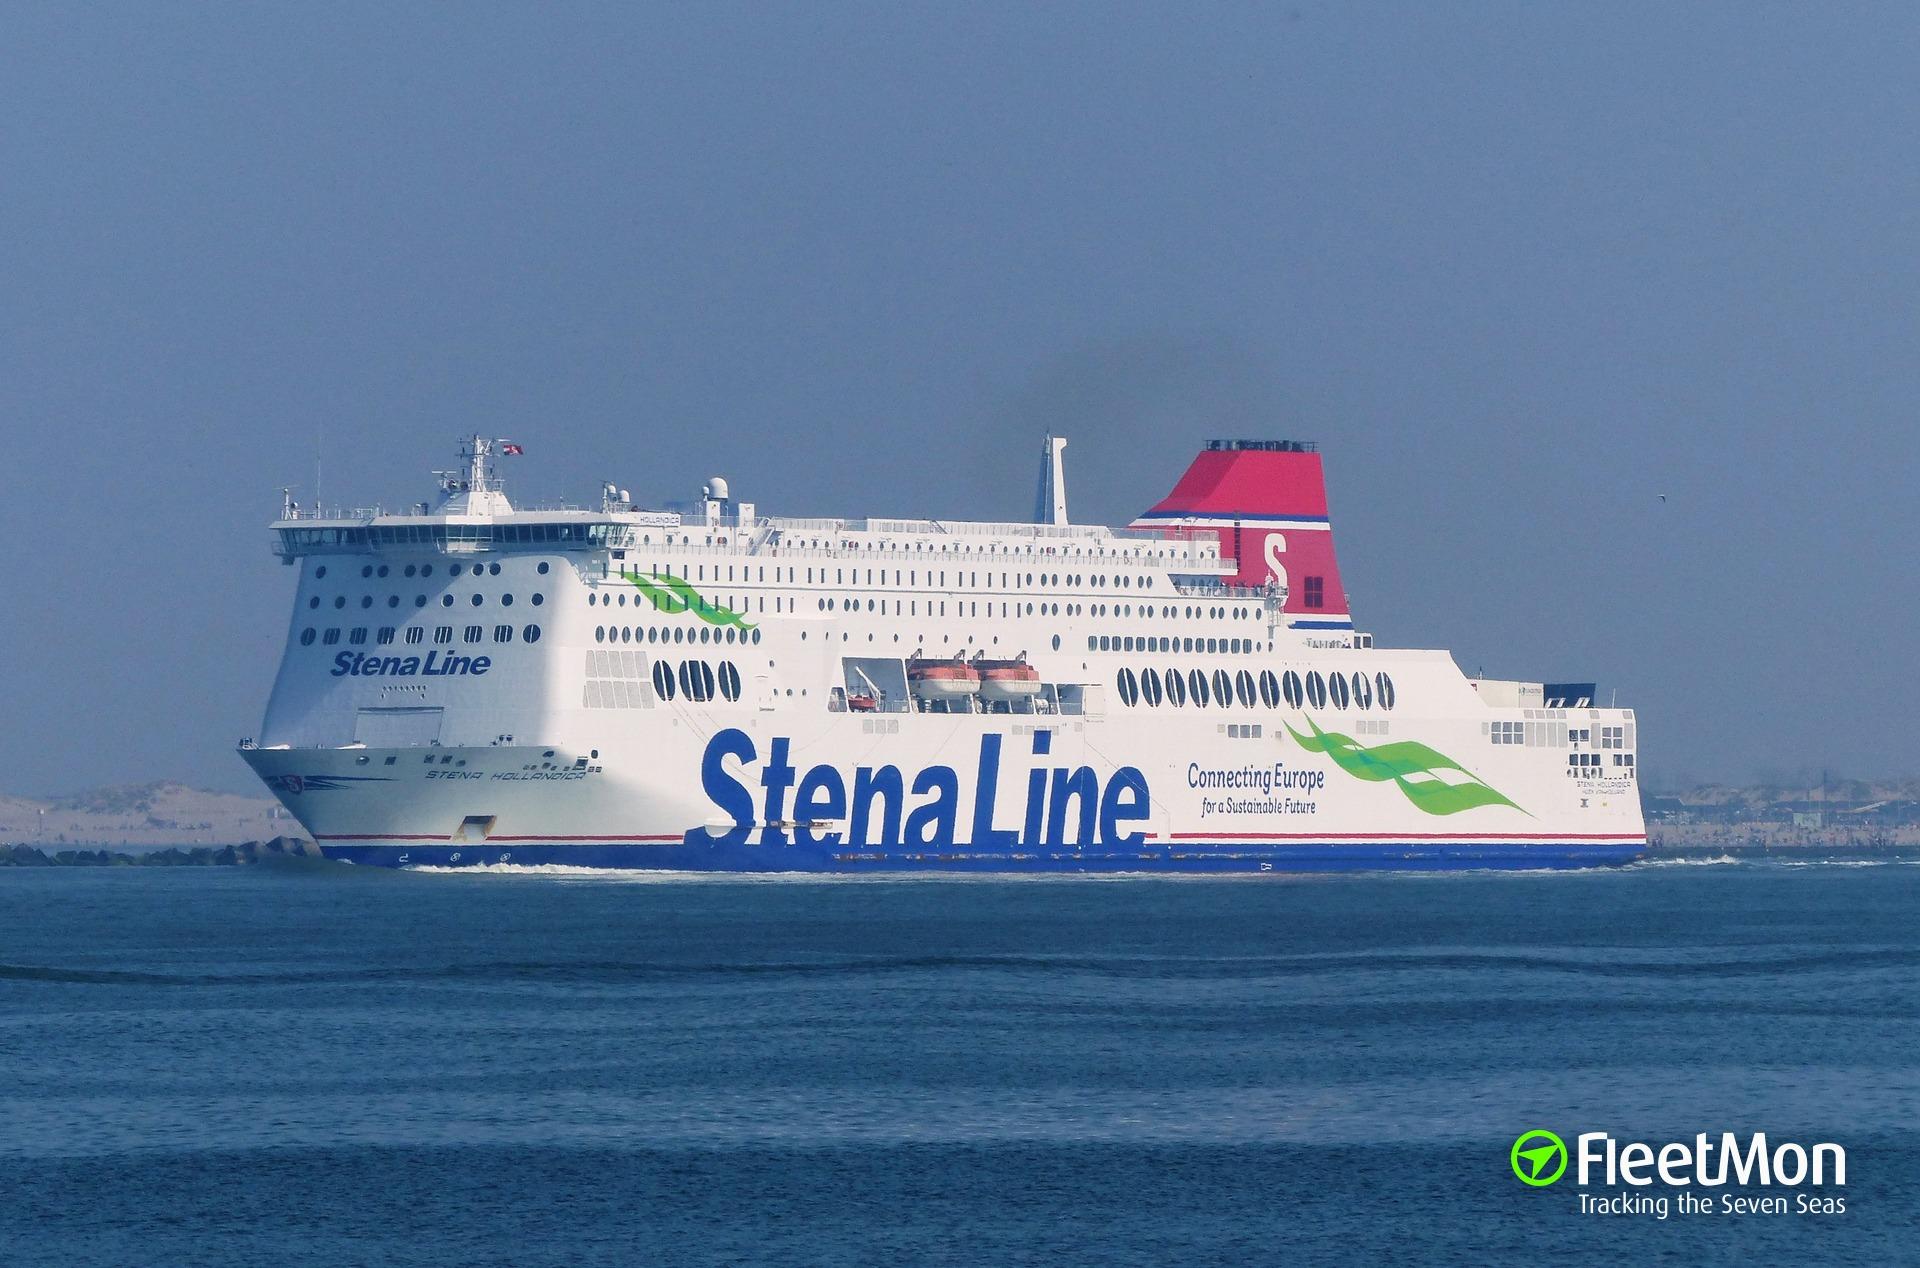 Photo of STENA HOLLANDICA (IMO: 9419163, MMSI: 244758000, Callsign